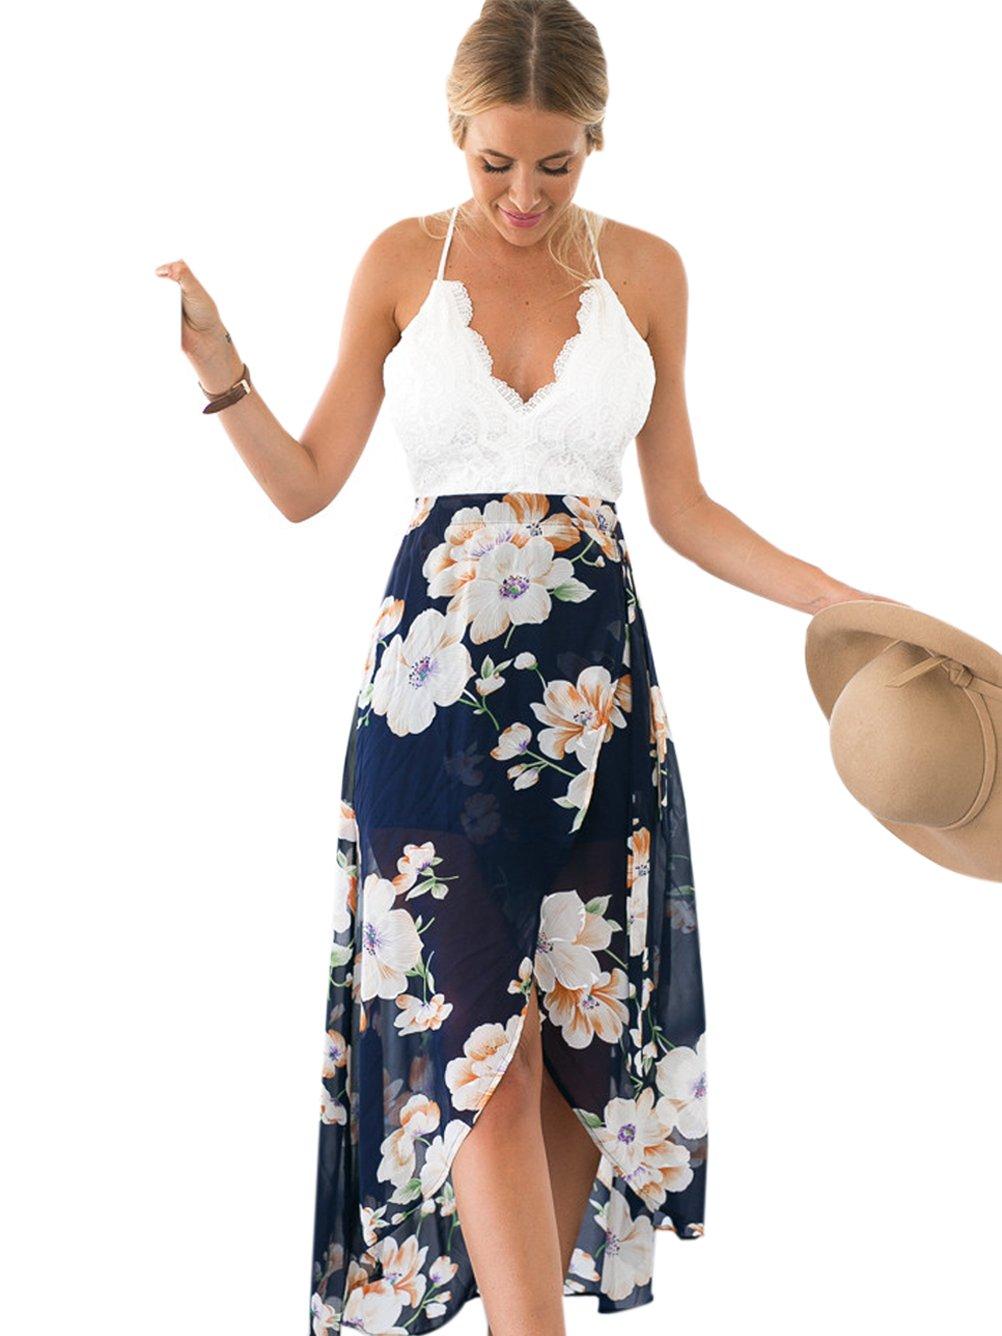 Blooming Jelly Women's Open Back Deep V Neck Sleeveless Summer Floral Maxi Dress (M)